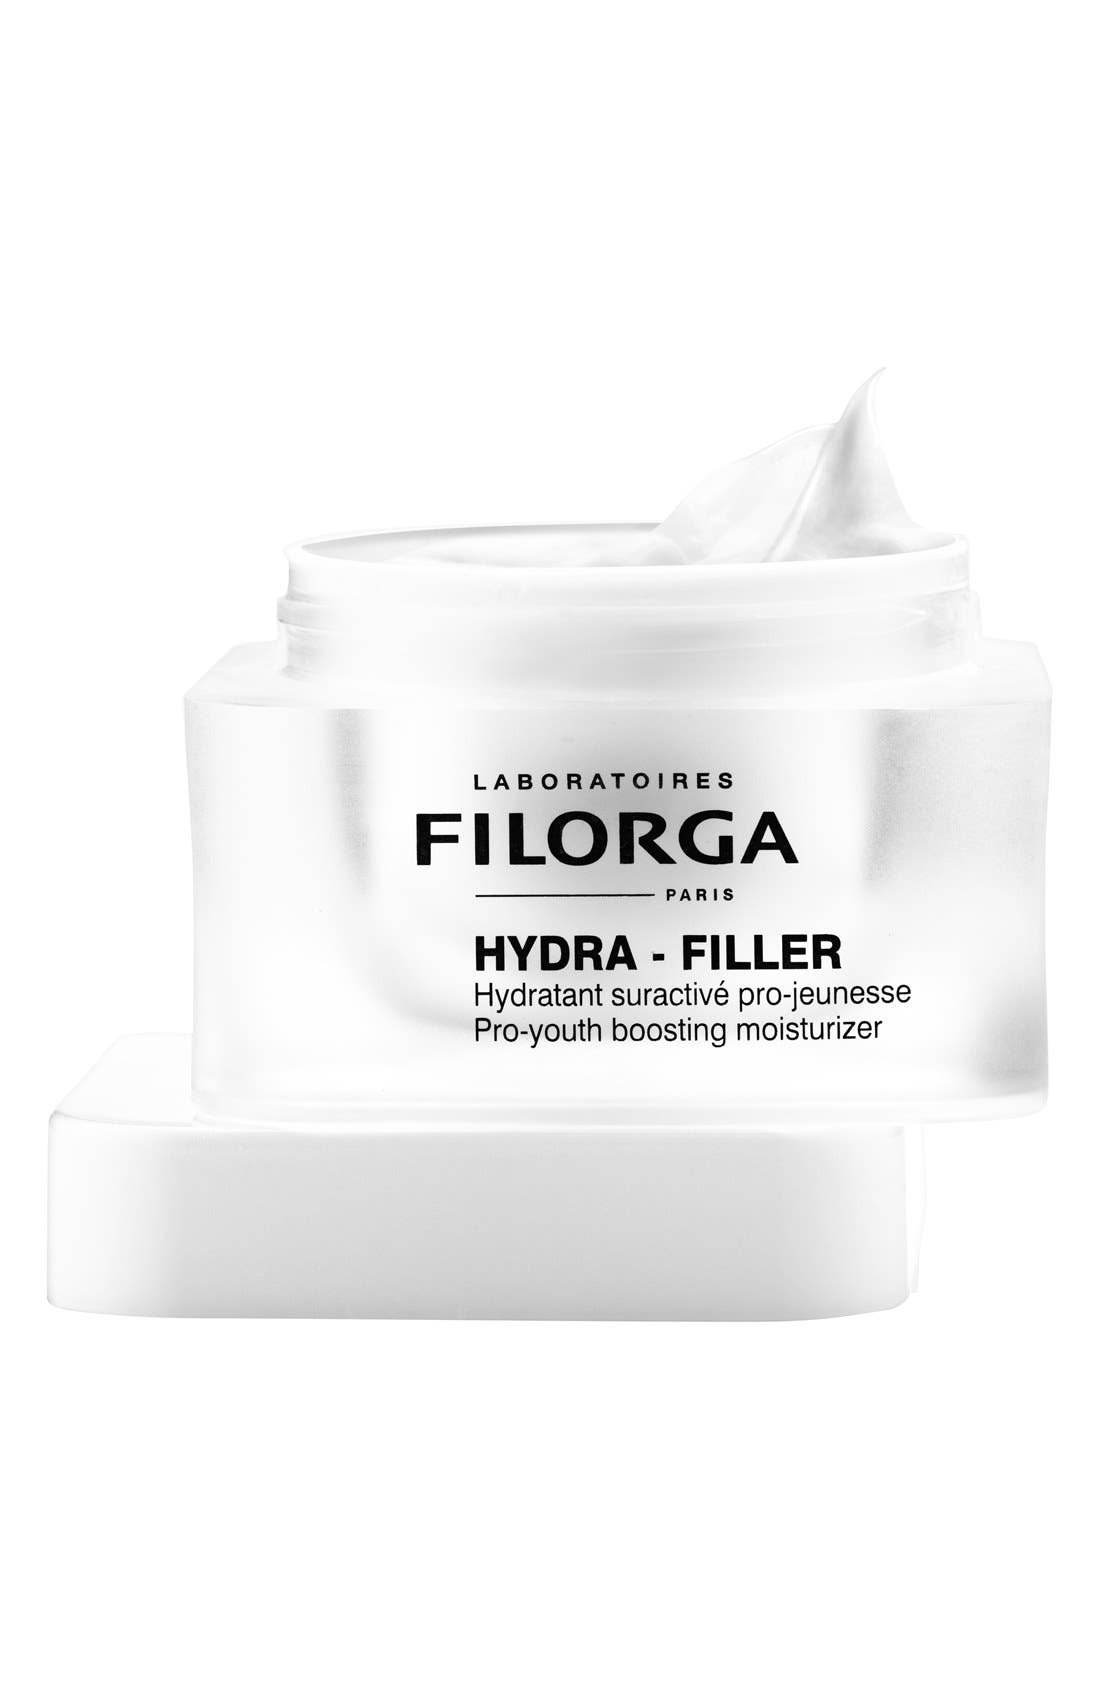 Filorga'Hydra-Filler' Pro-Youth Boosting Moisturizer